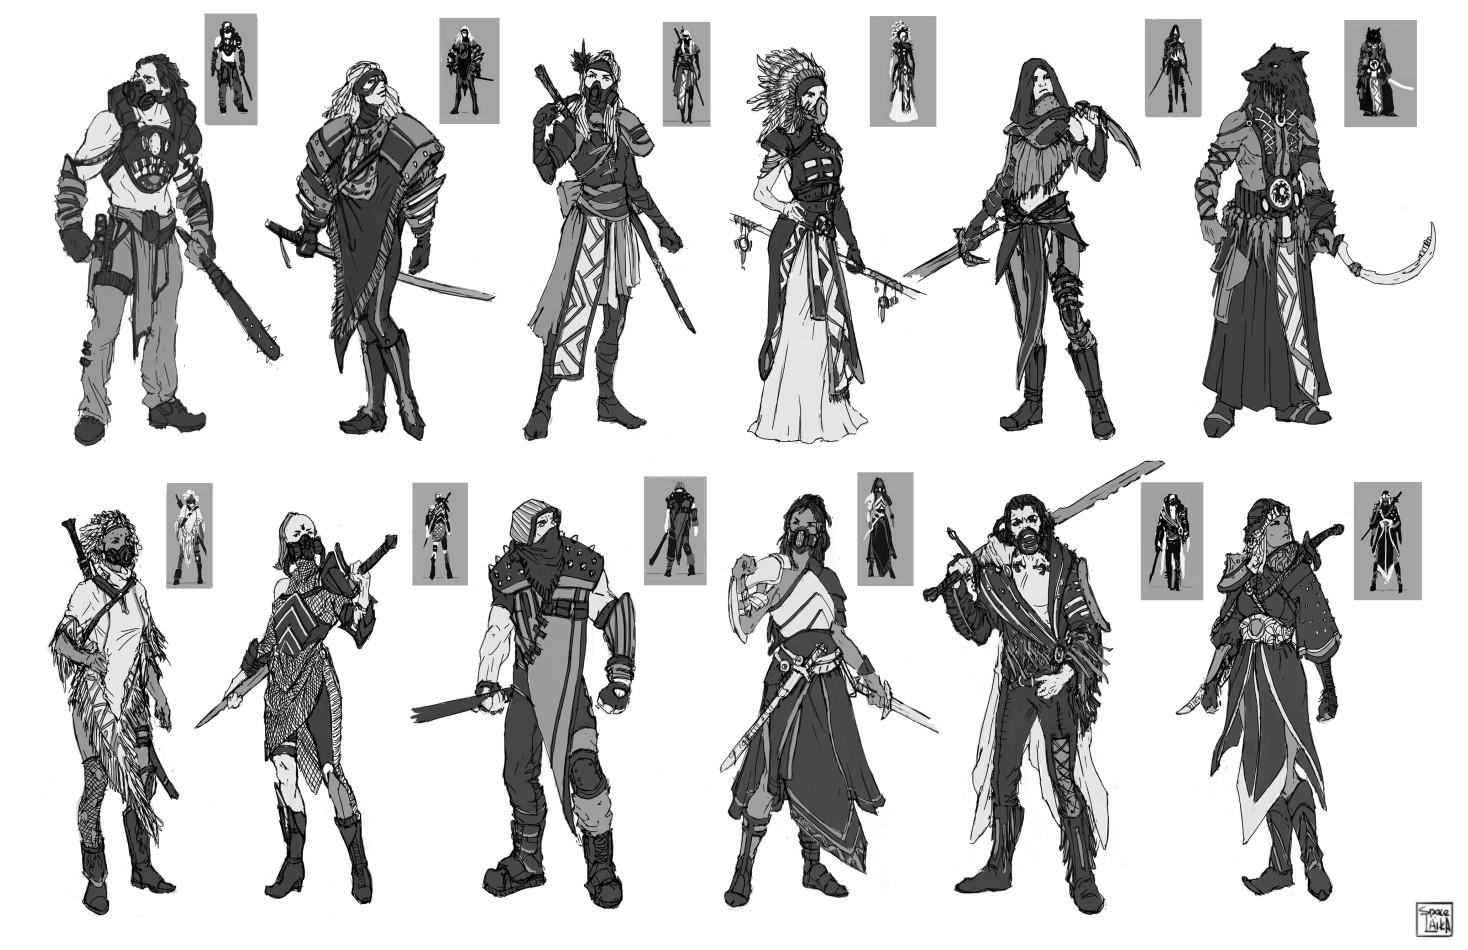 anna-orlova-hs-costume-concepts-by-spacelaika-d7t2umr.jpg